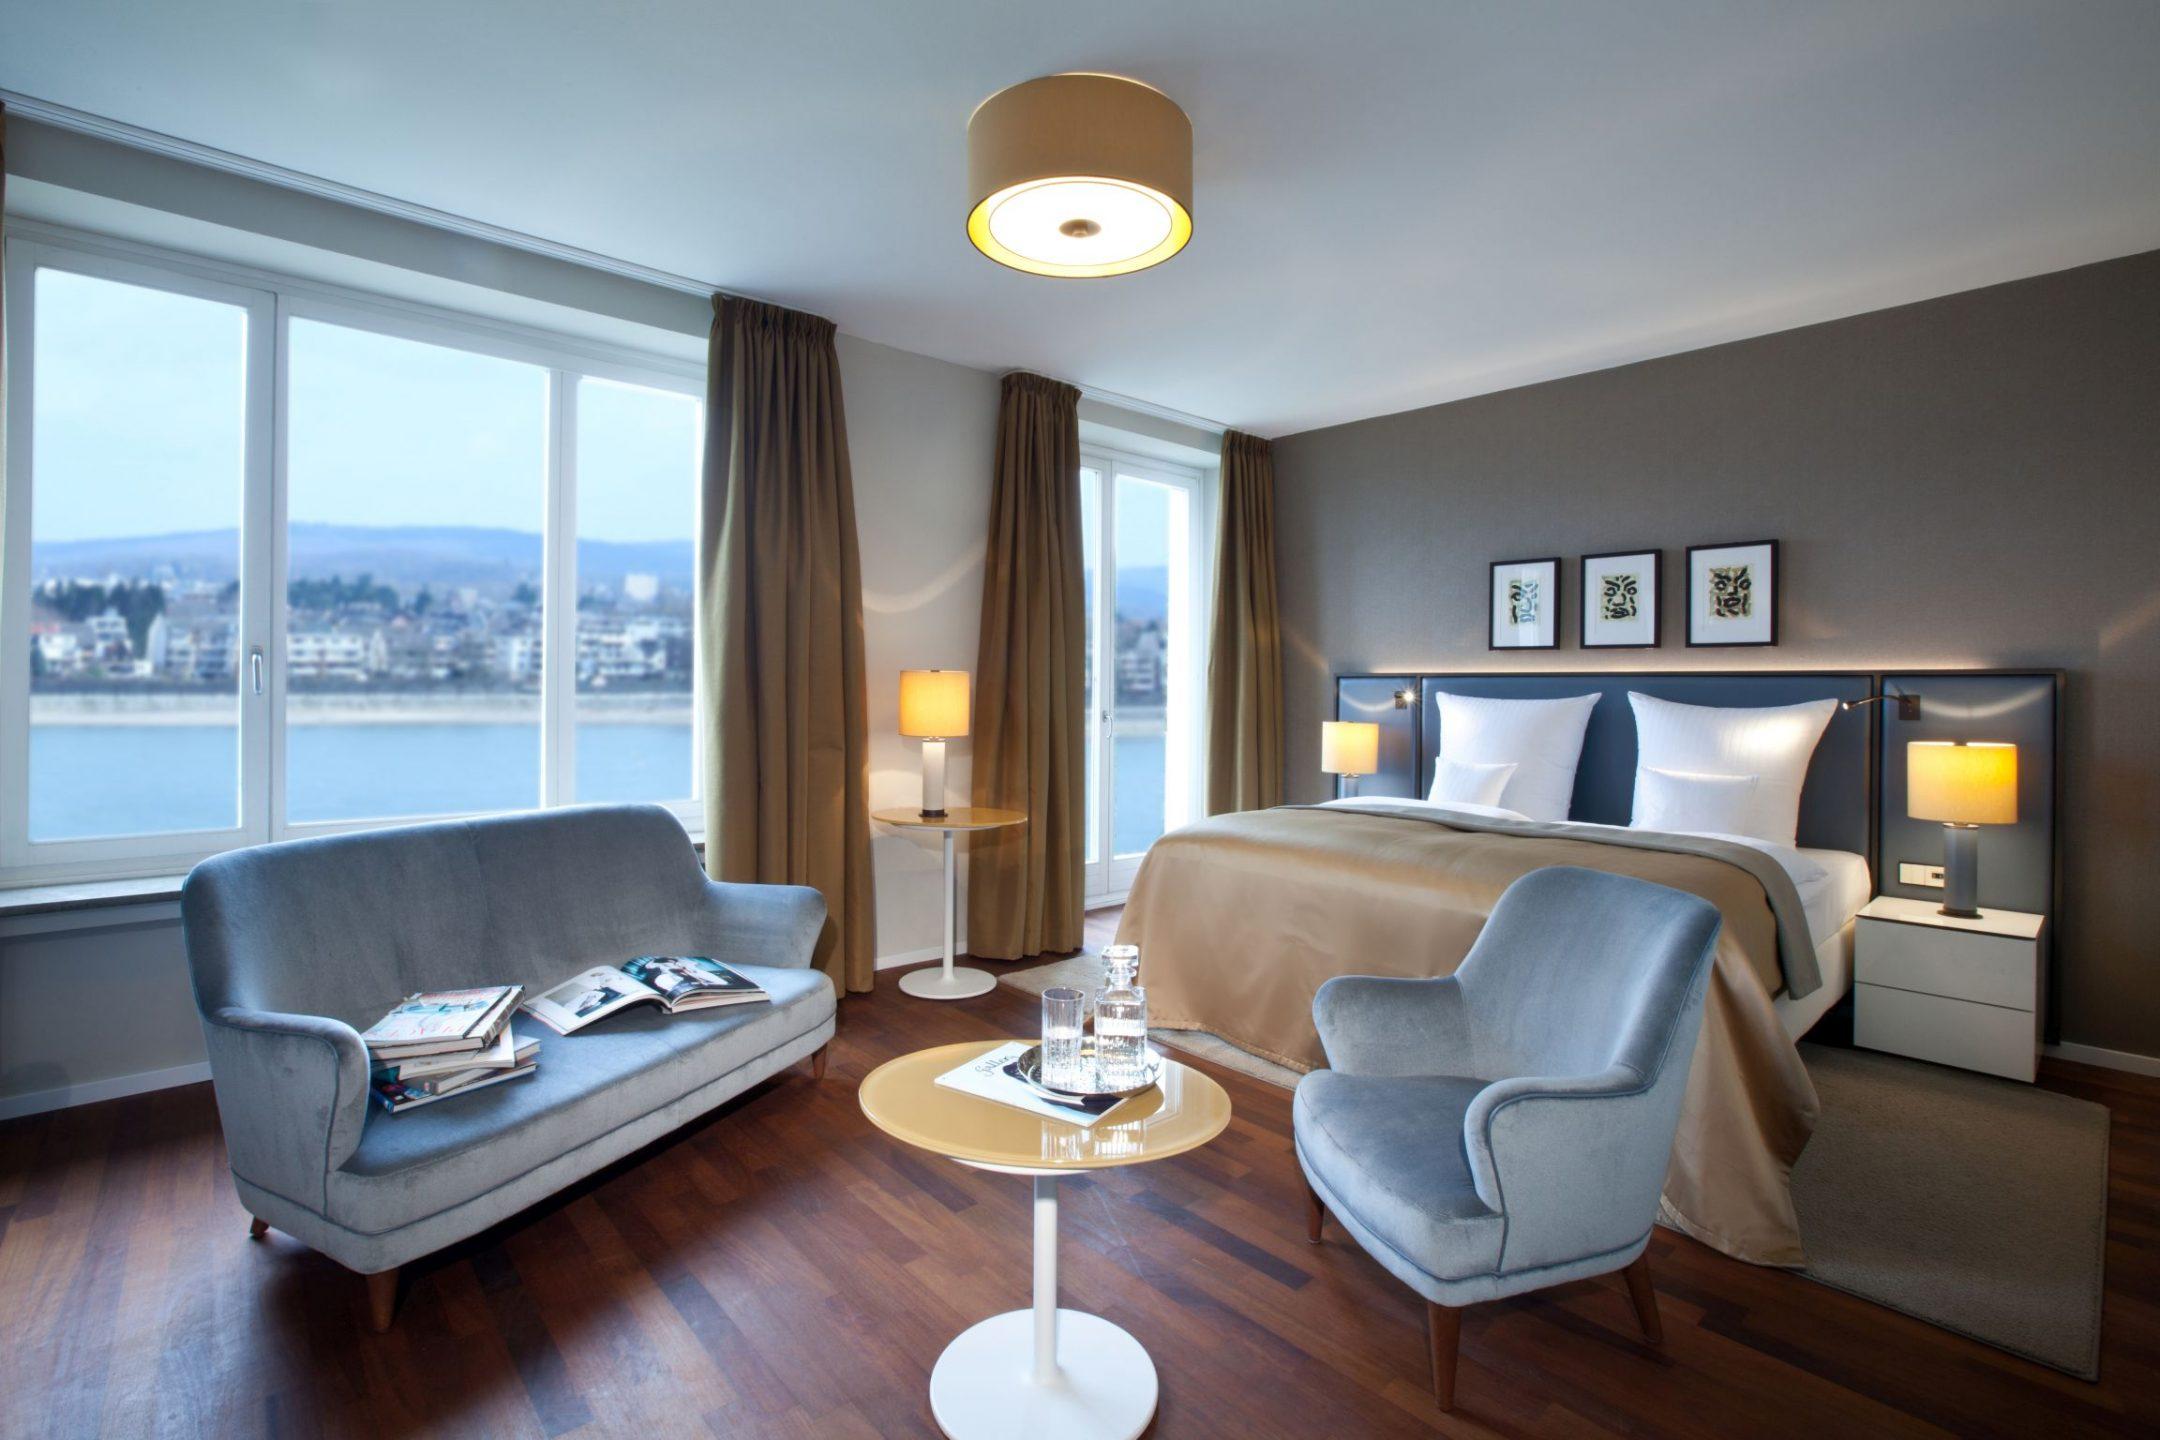 Ameron Bonn Hotel Konigshof Hochzeit De